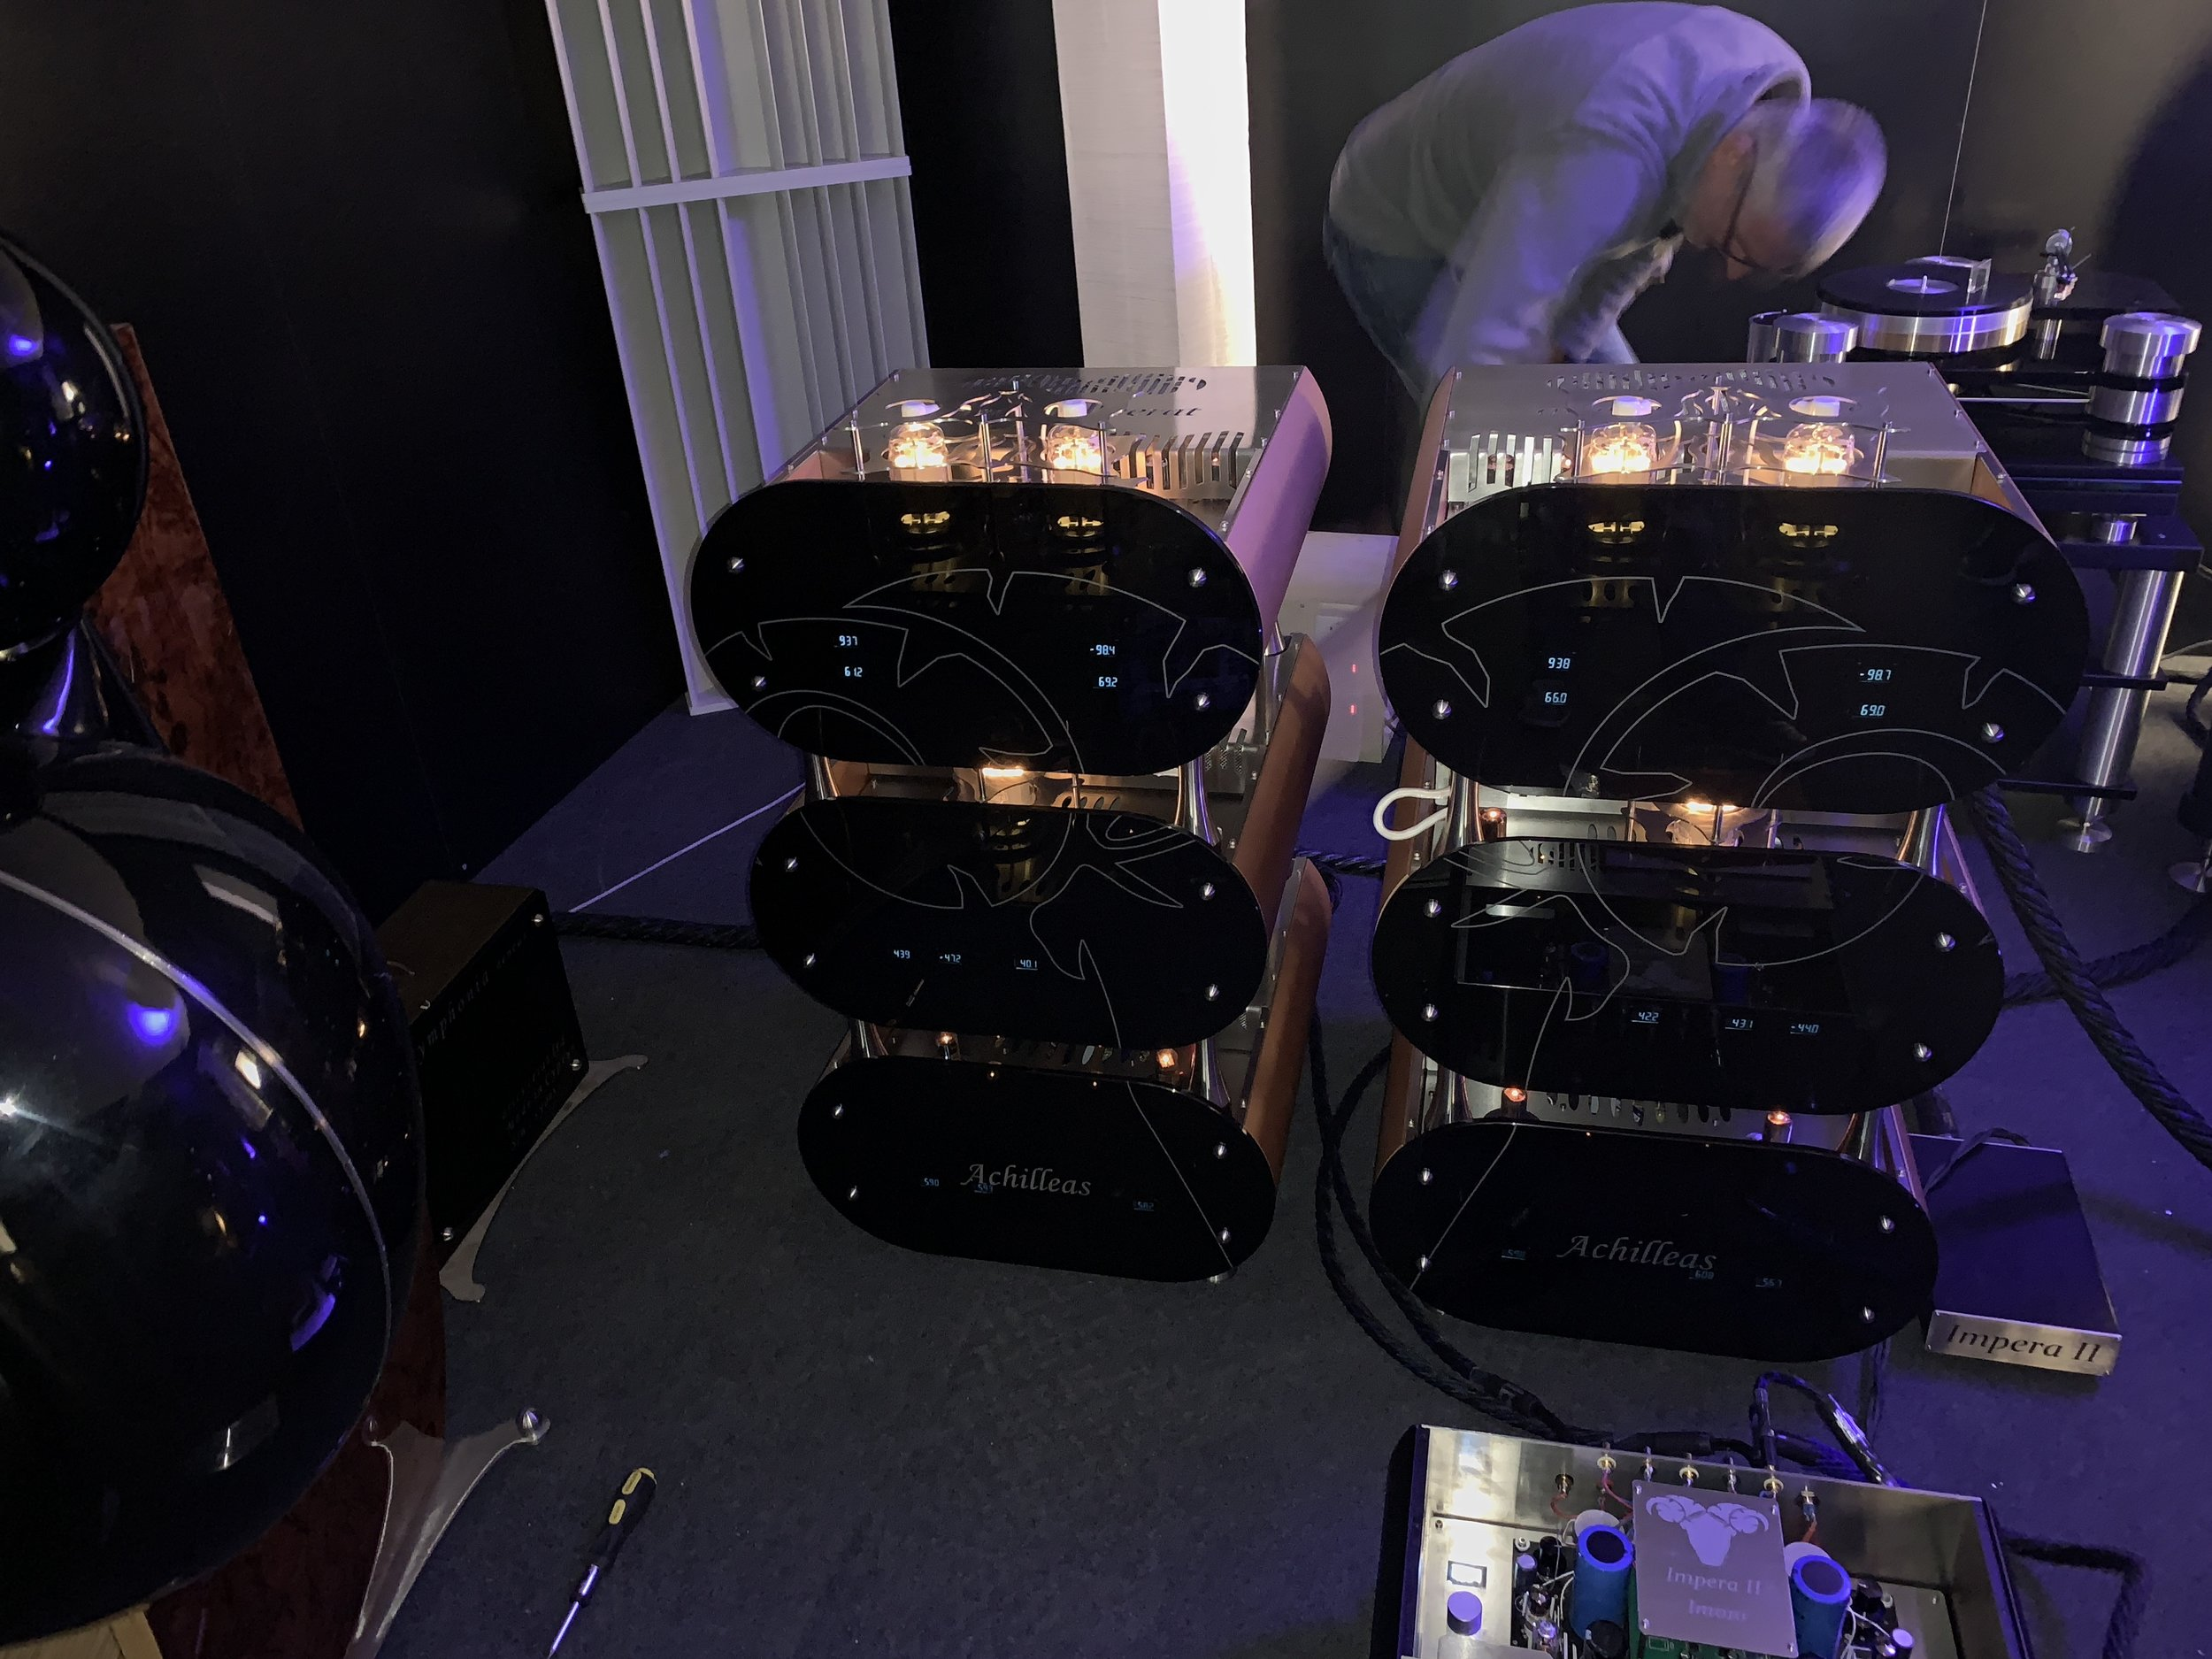 Aries Cerat - Achilleas Power Amplifier - Legend Series